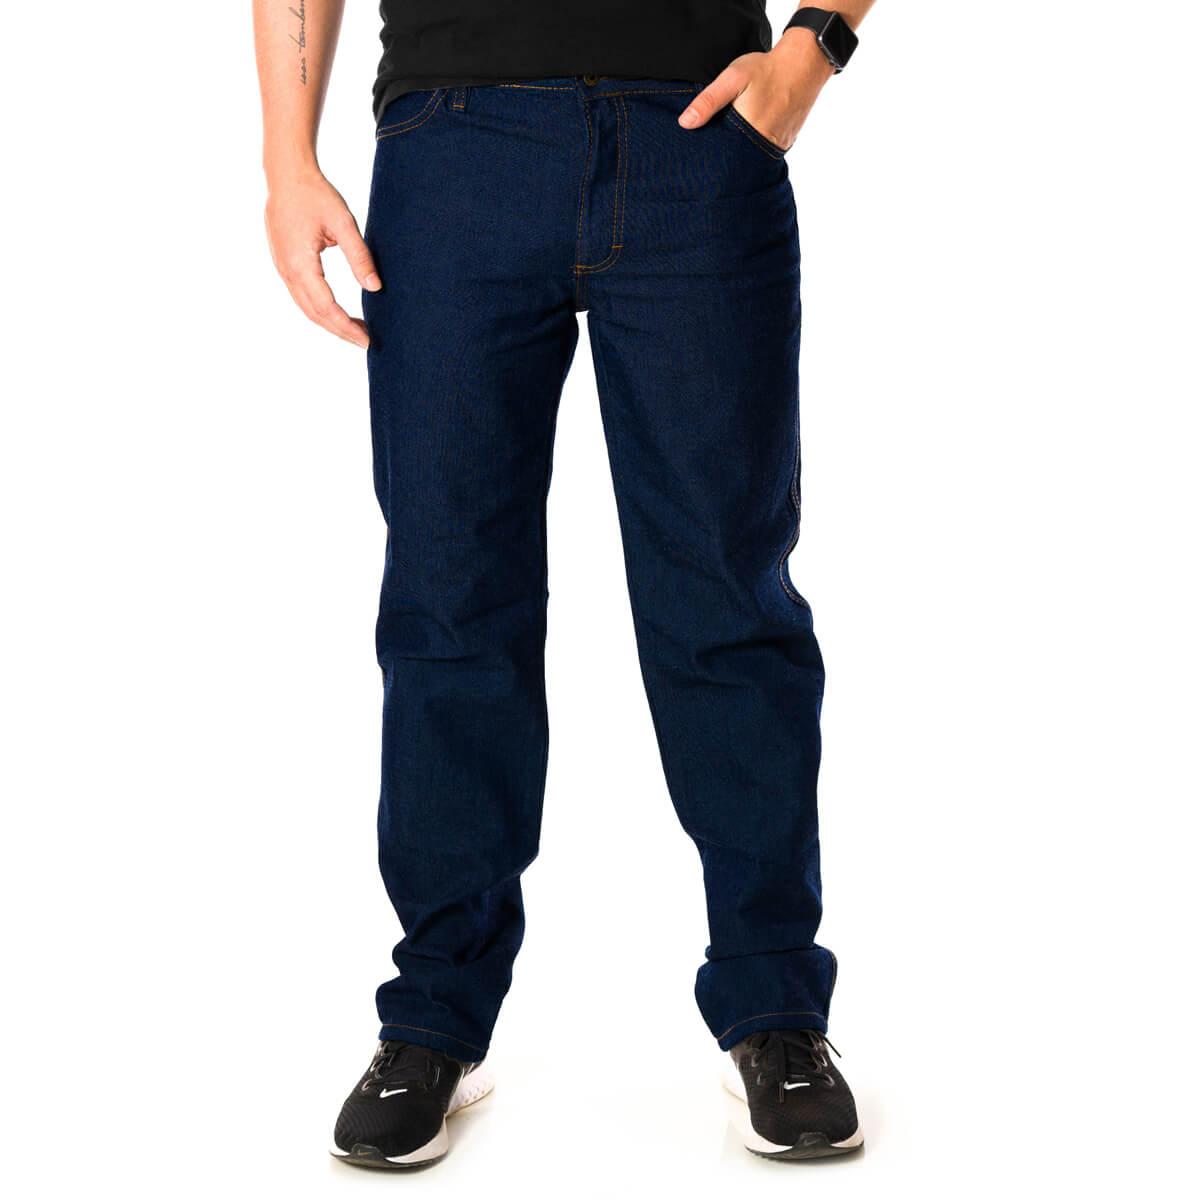 Calça Jeans Masculina Básica Tradicional